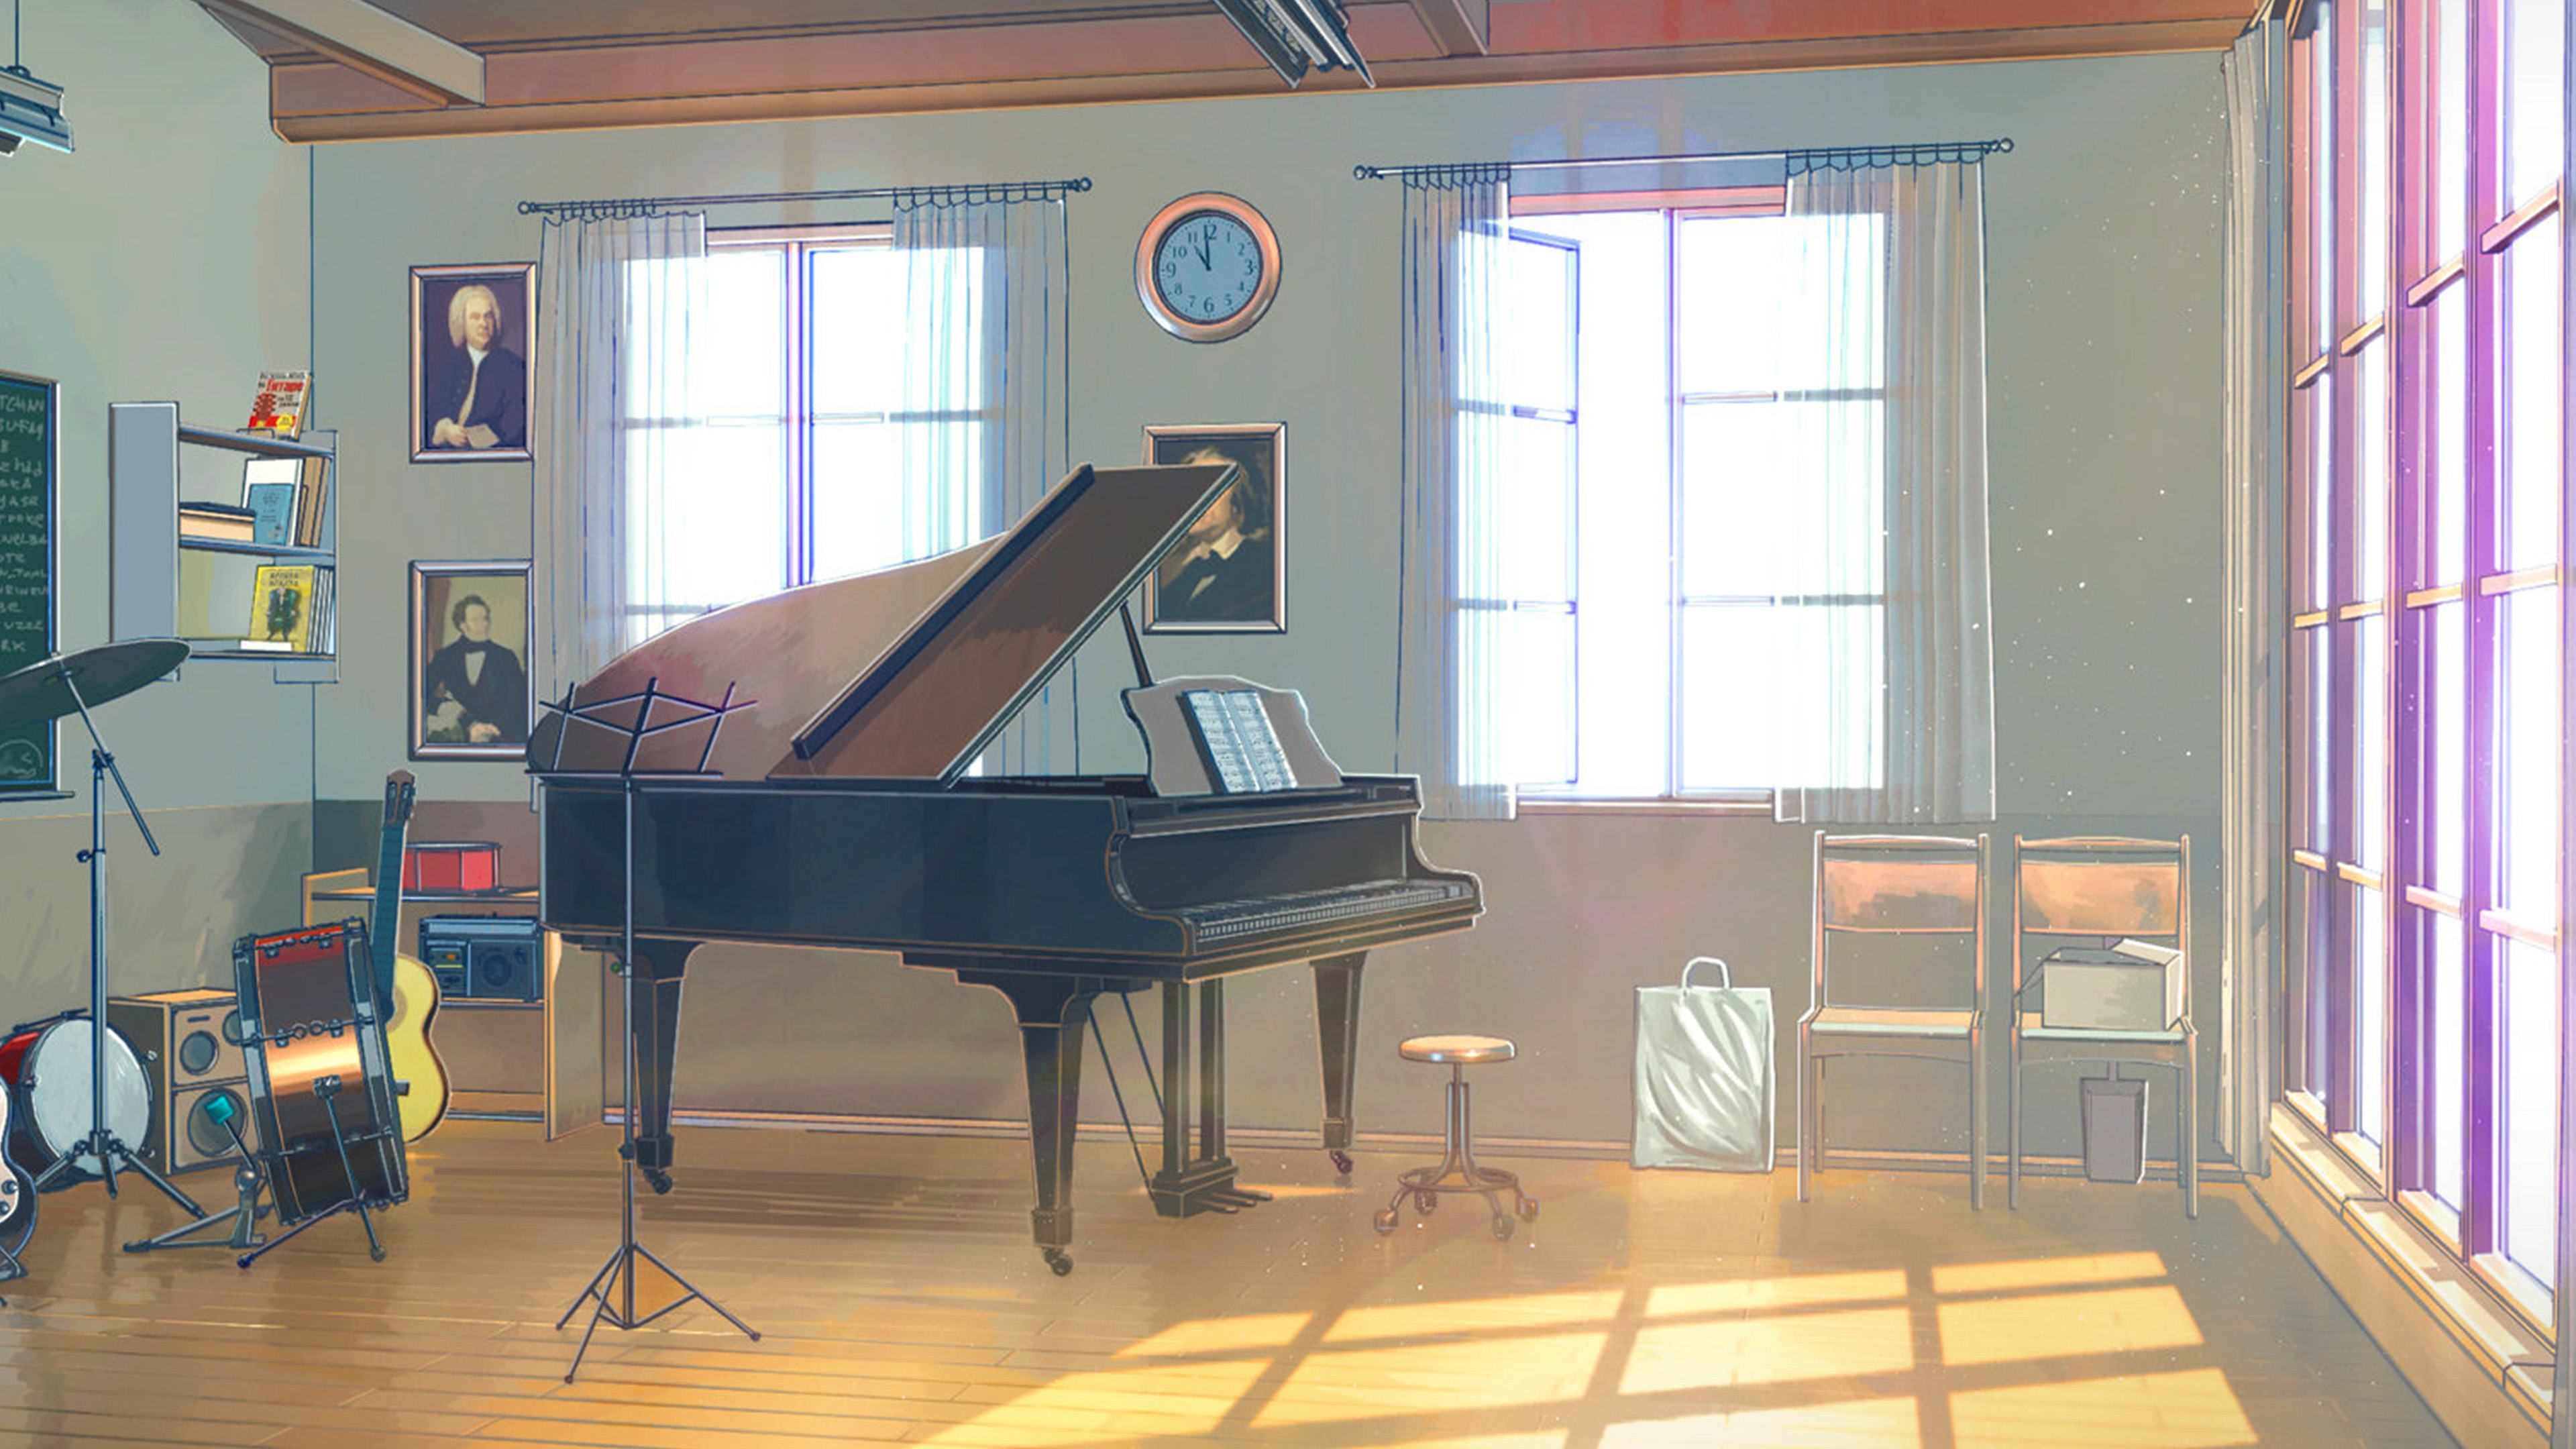 aw48-arseniy-chebynkin-music-room-piano-illustration-art ...